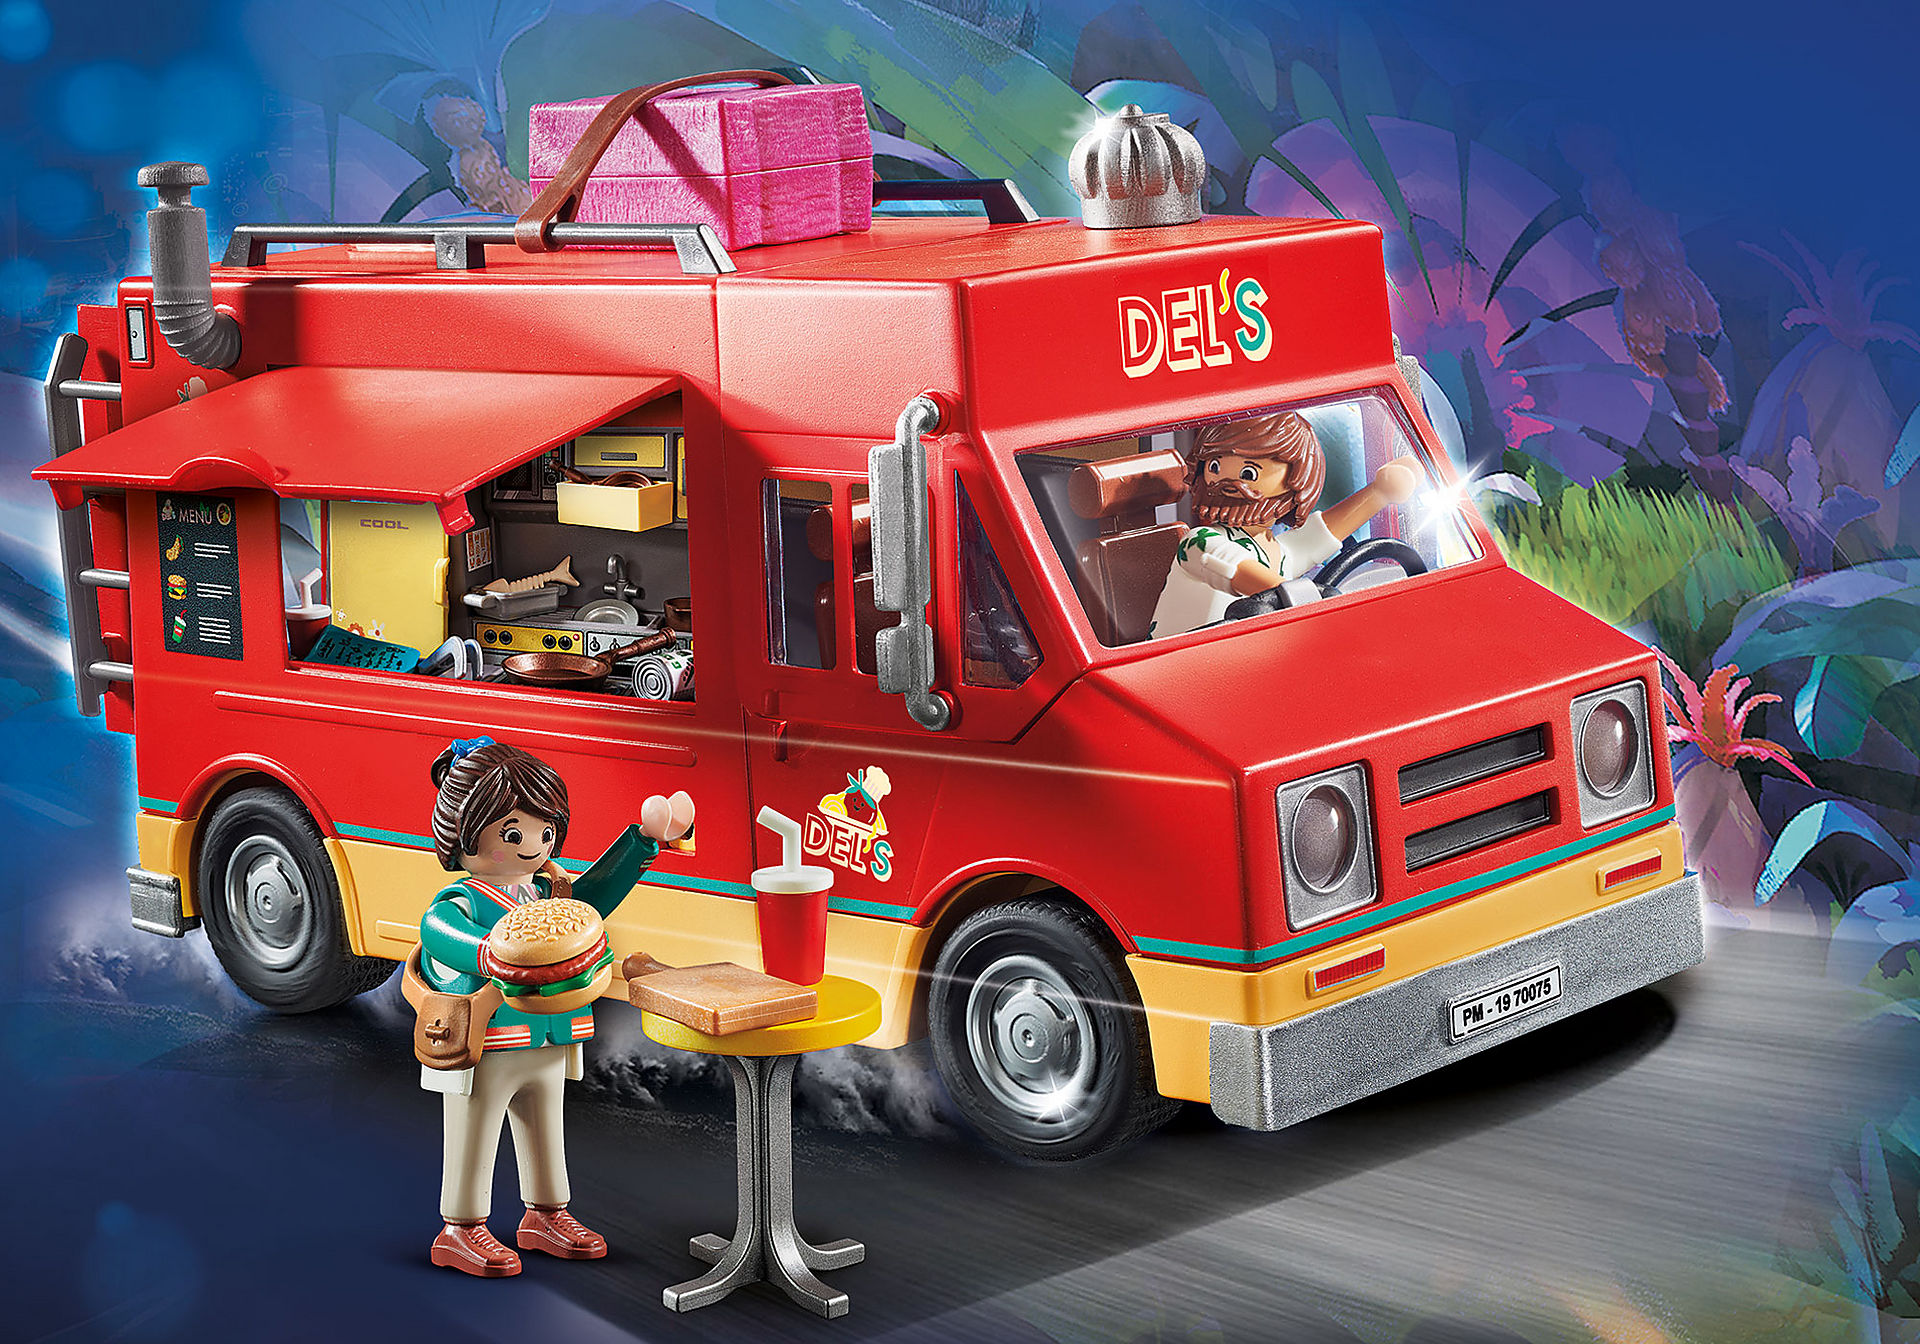 70075 PLAYMOBIL: THE MOVIE Food Truck de Del  zoom image1